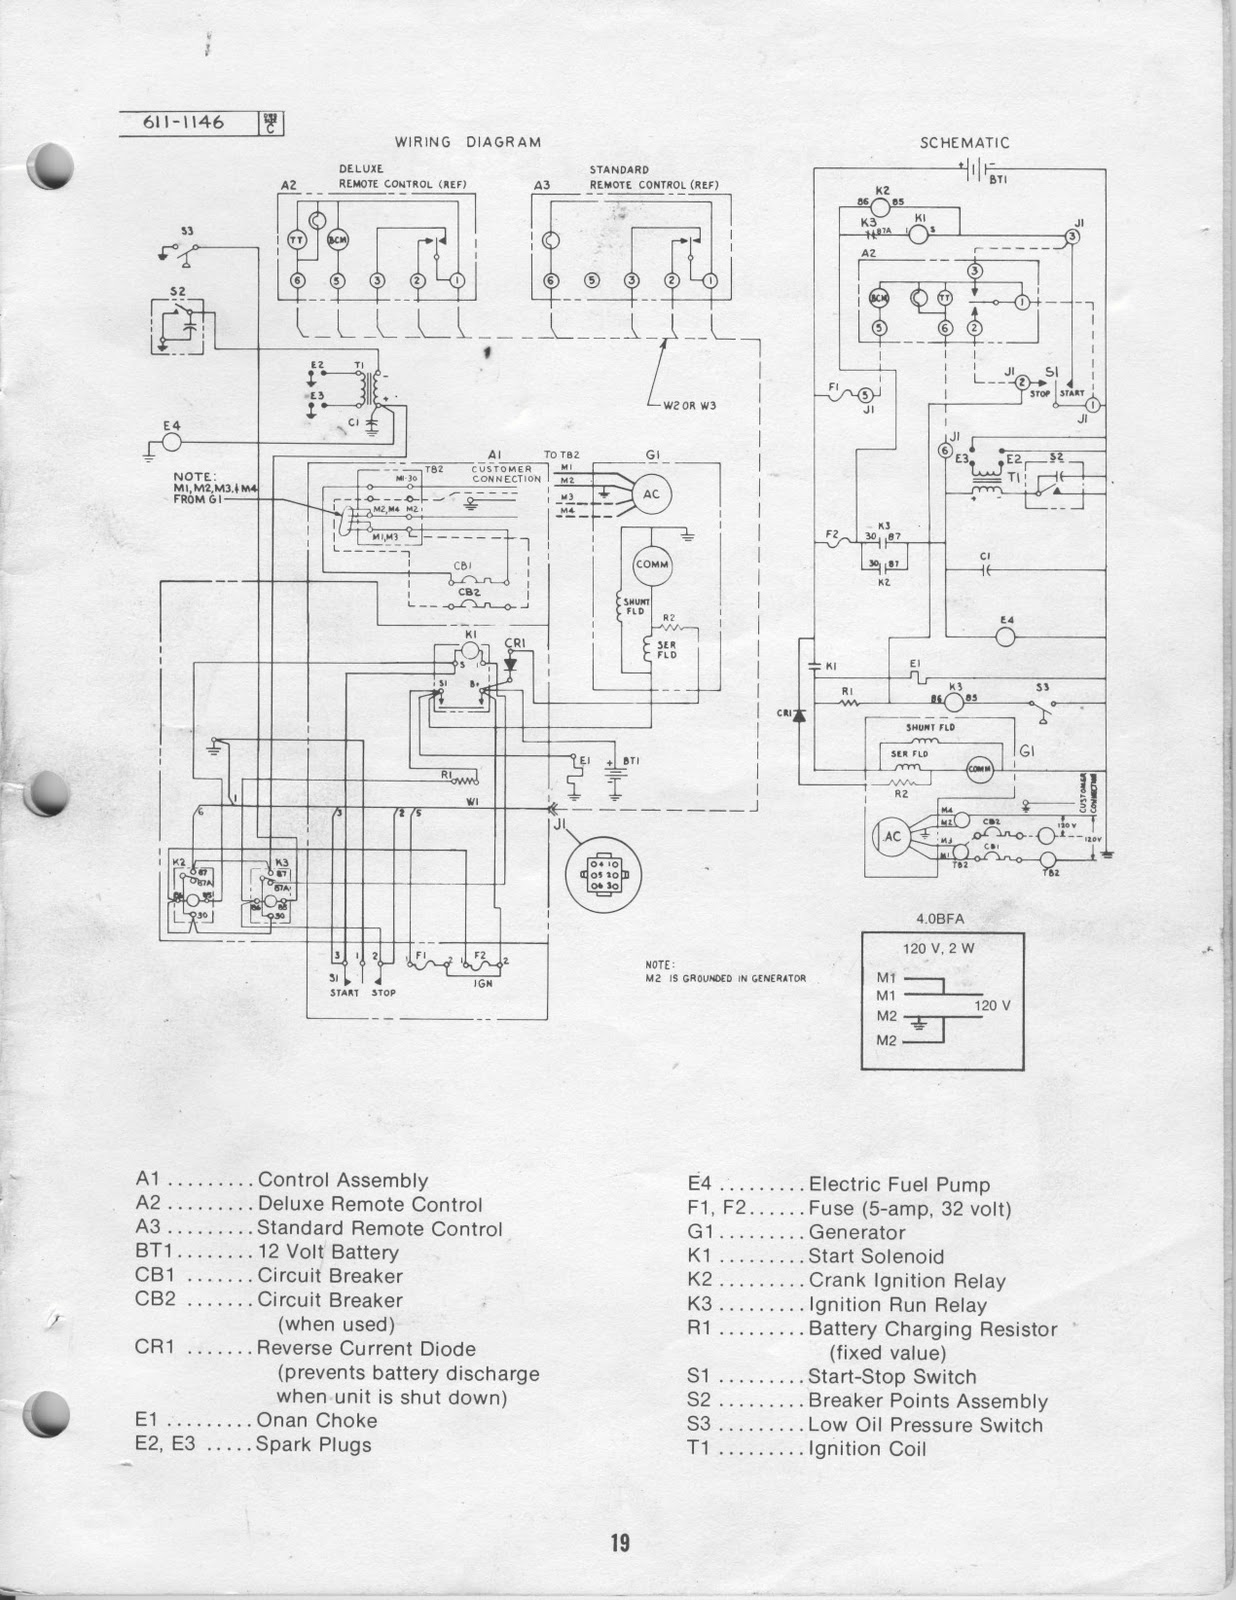 onan fuel pump wiring diagram vs 2375  generator remote start switch on 2800 onan start stop  generator remote start switch on 2800